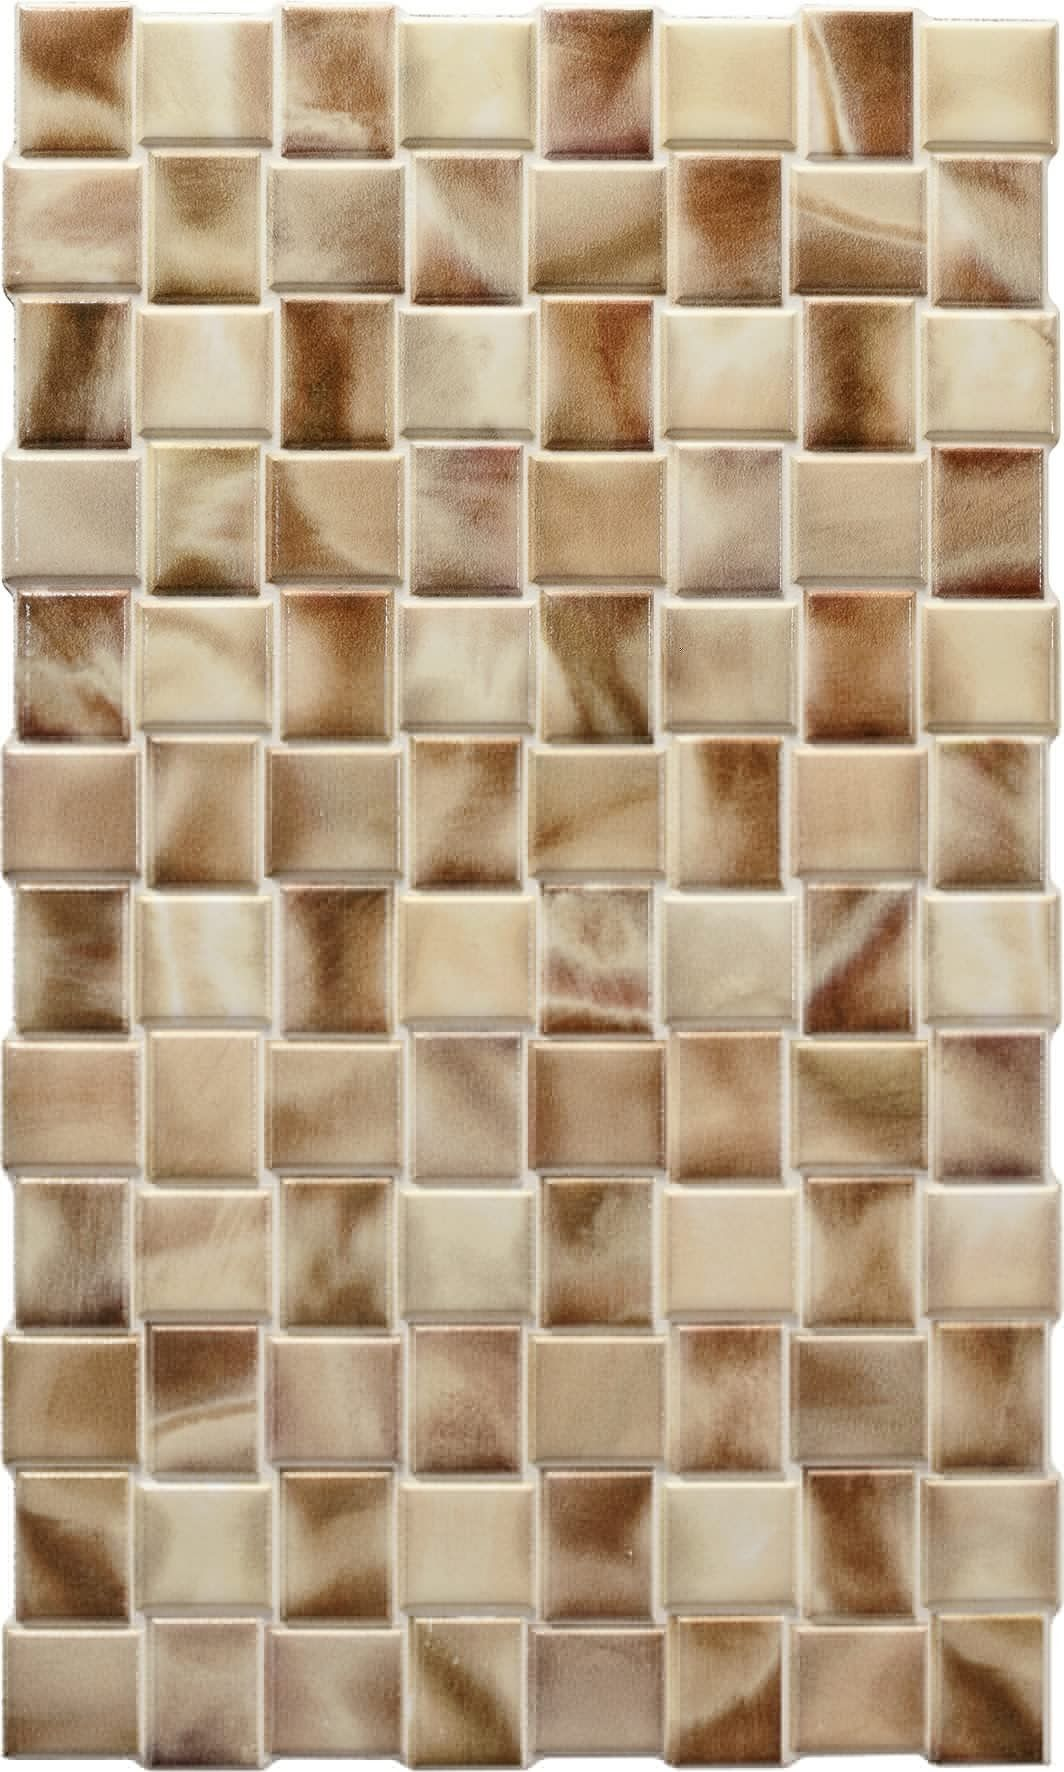 Dado tango marrone 20x333 cm 302724 porcelain stoneware dado tango marrone 20x333 cm 302724 porcelain stoneware stone tangoeurostonewaretilesporcelainceramics doublecrazyfo Gallery